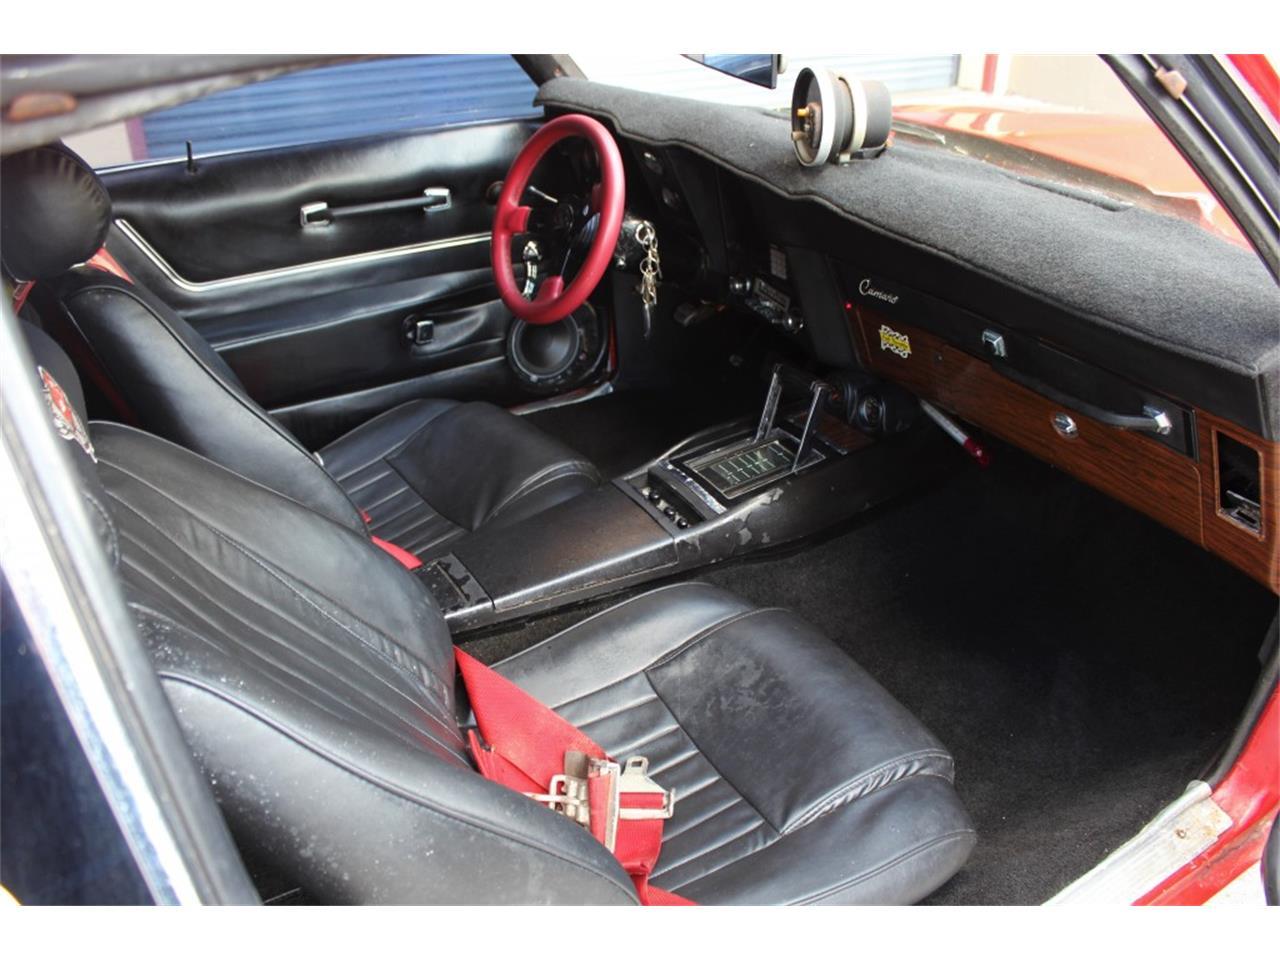 Large Picture of Classic 1969 Chevrolet Camaro located in Florida - $16,490.00 - MFS8